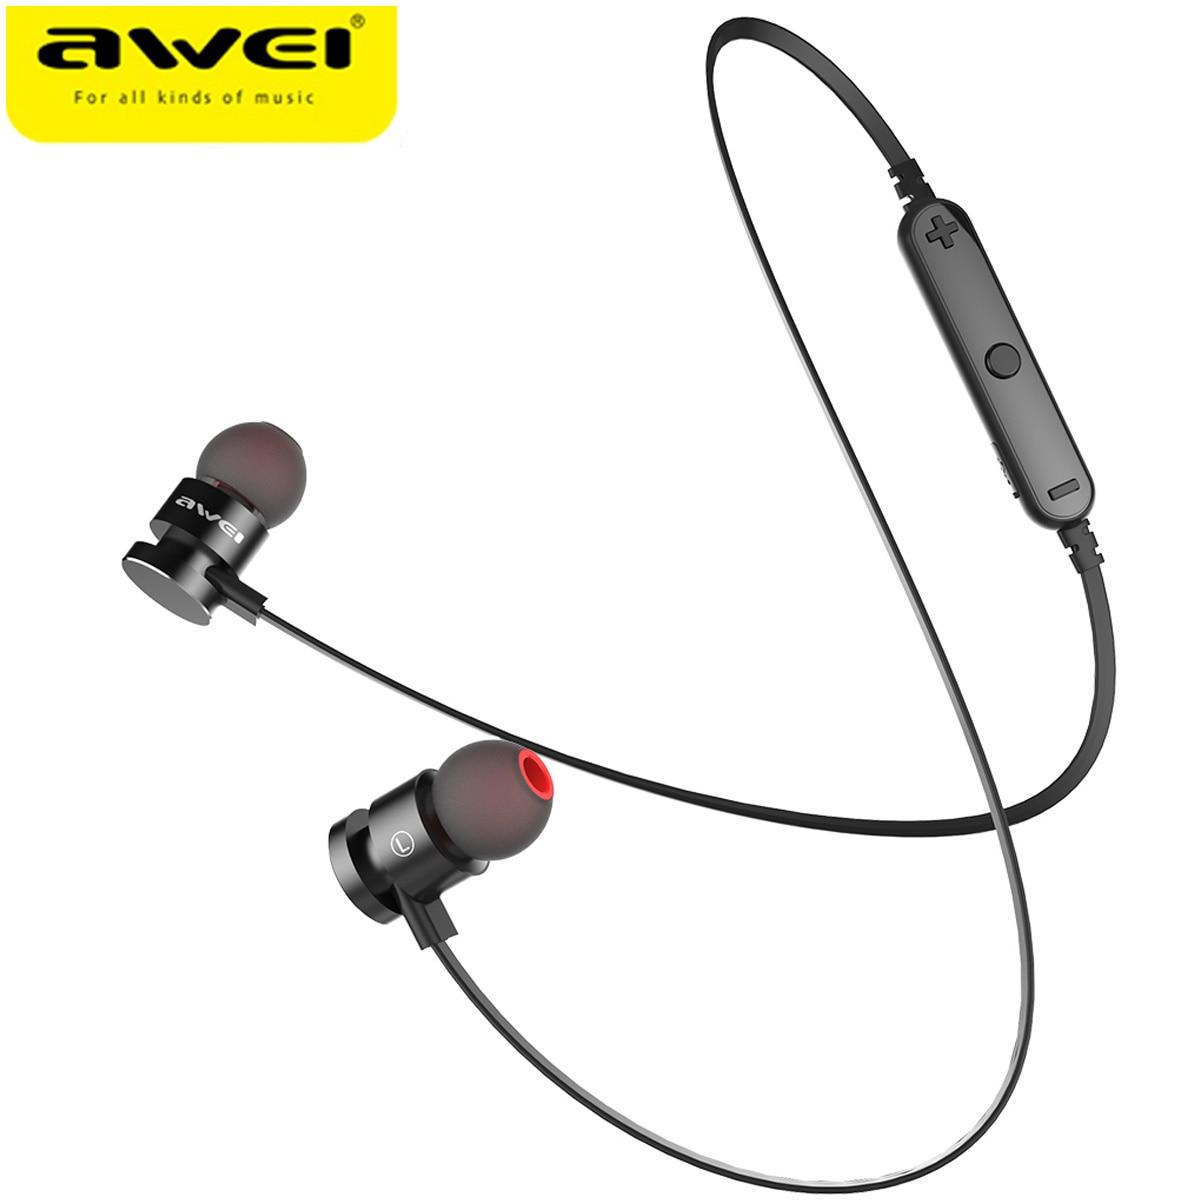 AWEI T11 Drahtlose Kopfhörer Bluetooth Kopfhörer Fone de ouvido Für Telefon Kulakl k Nackenbügel Écouteur Auriculares Bluetooth V4.2